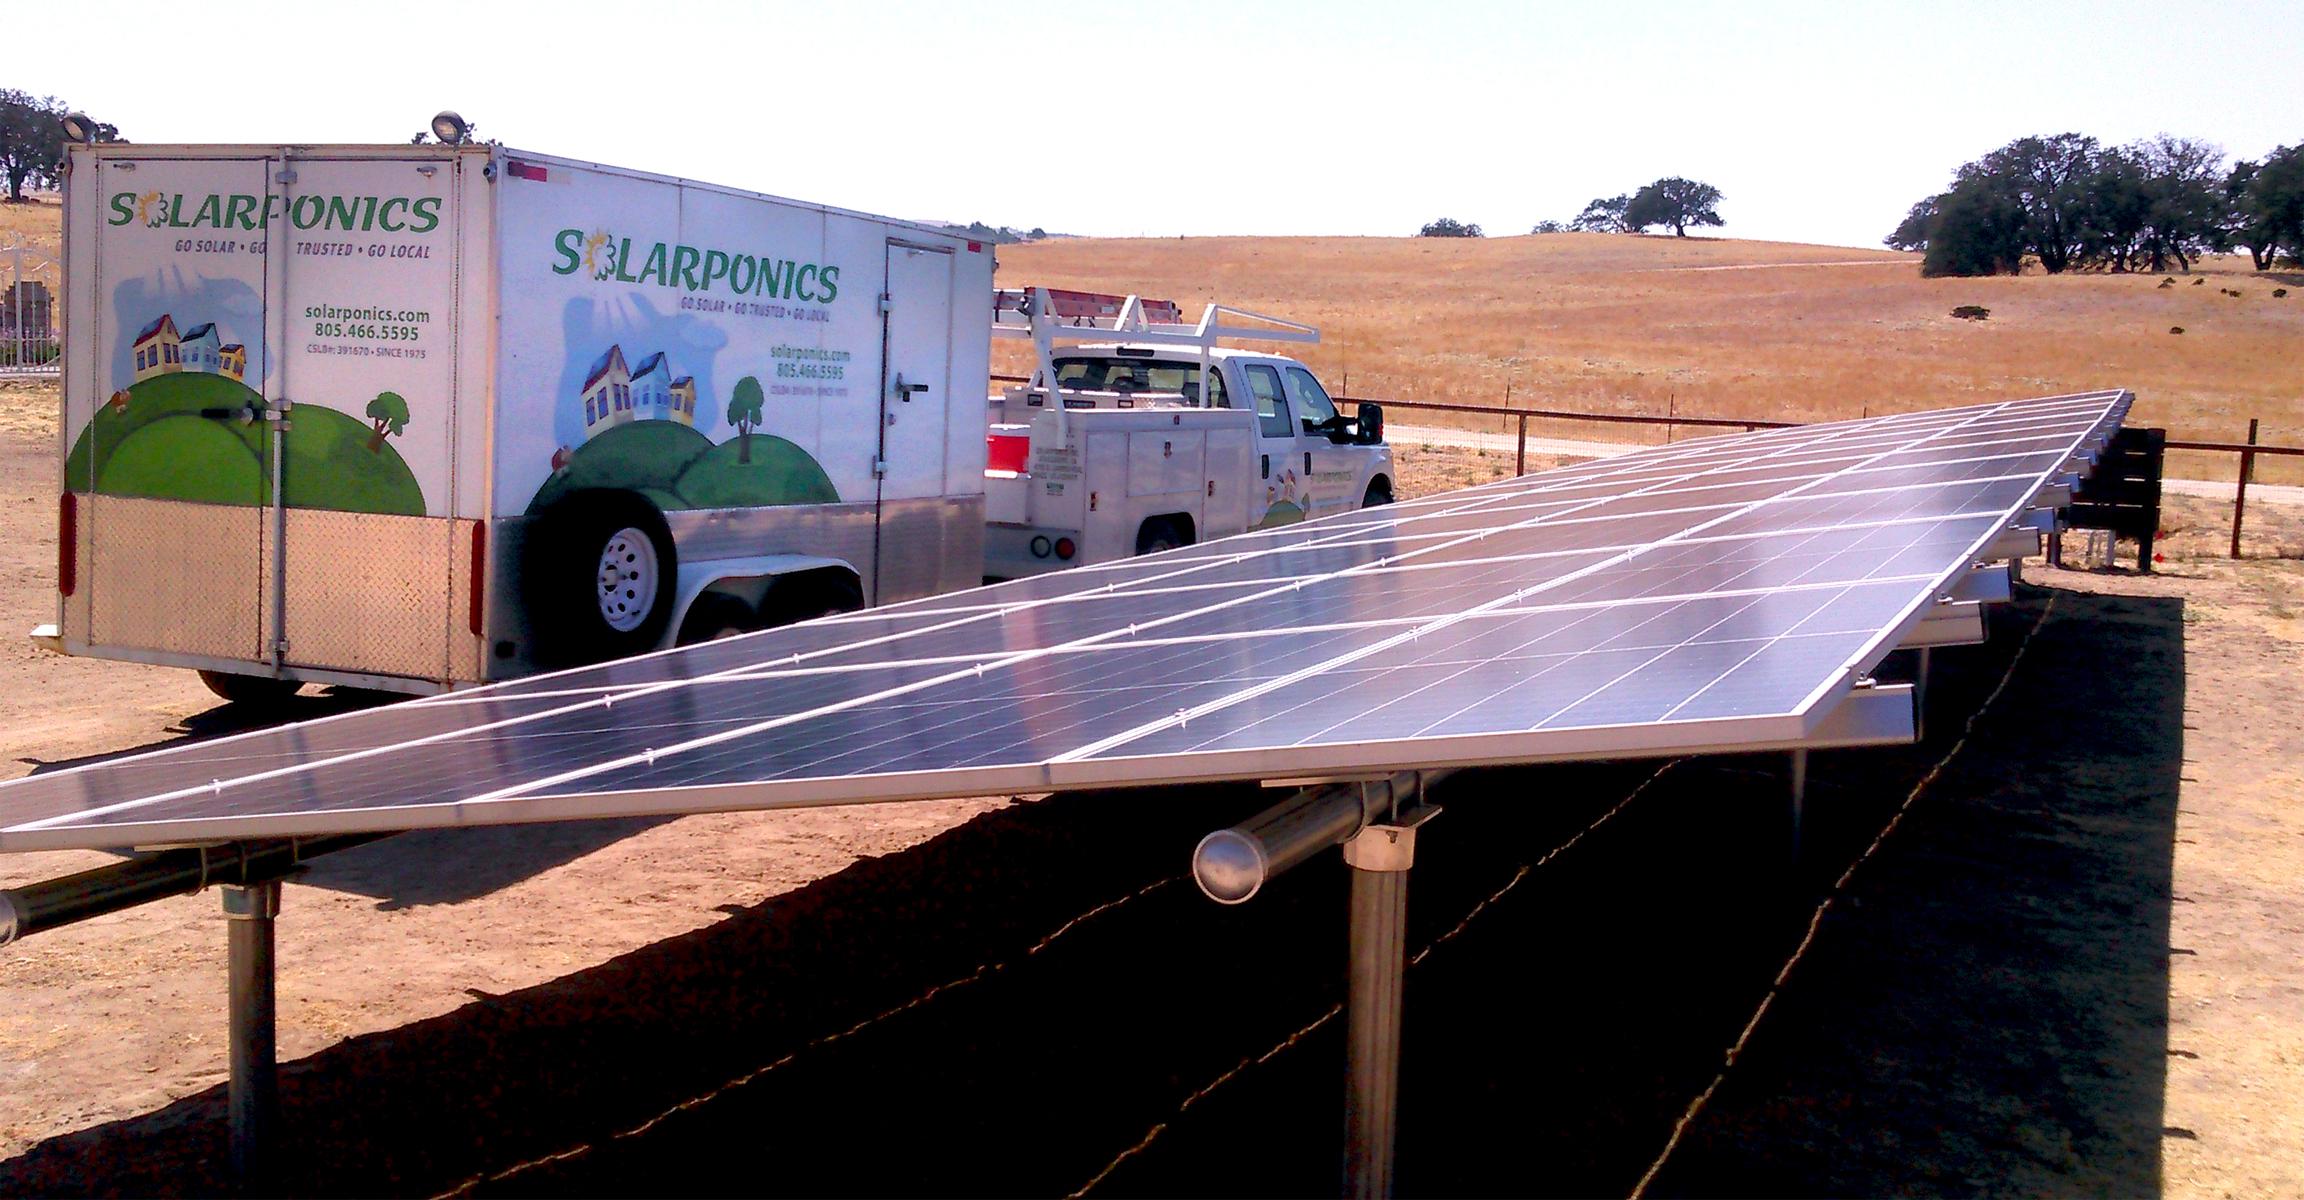 Atascadero solar ground mount by Solarponics.